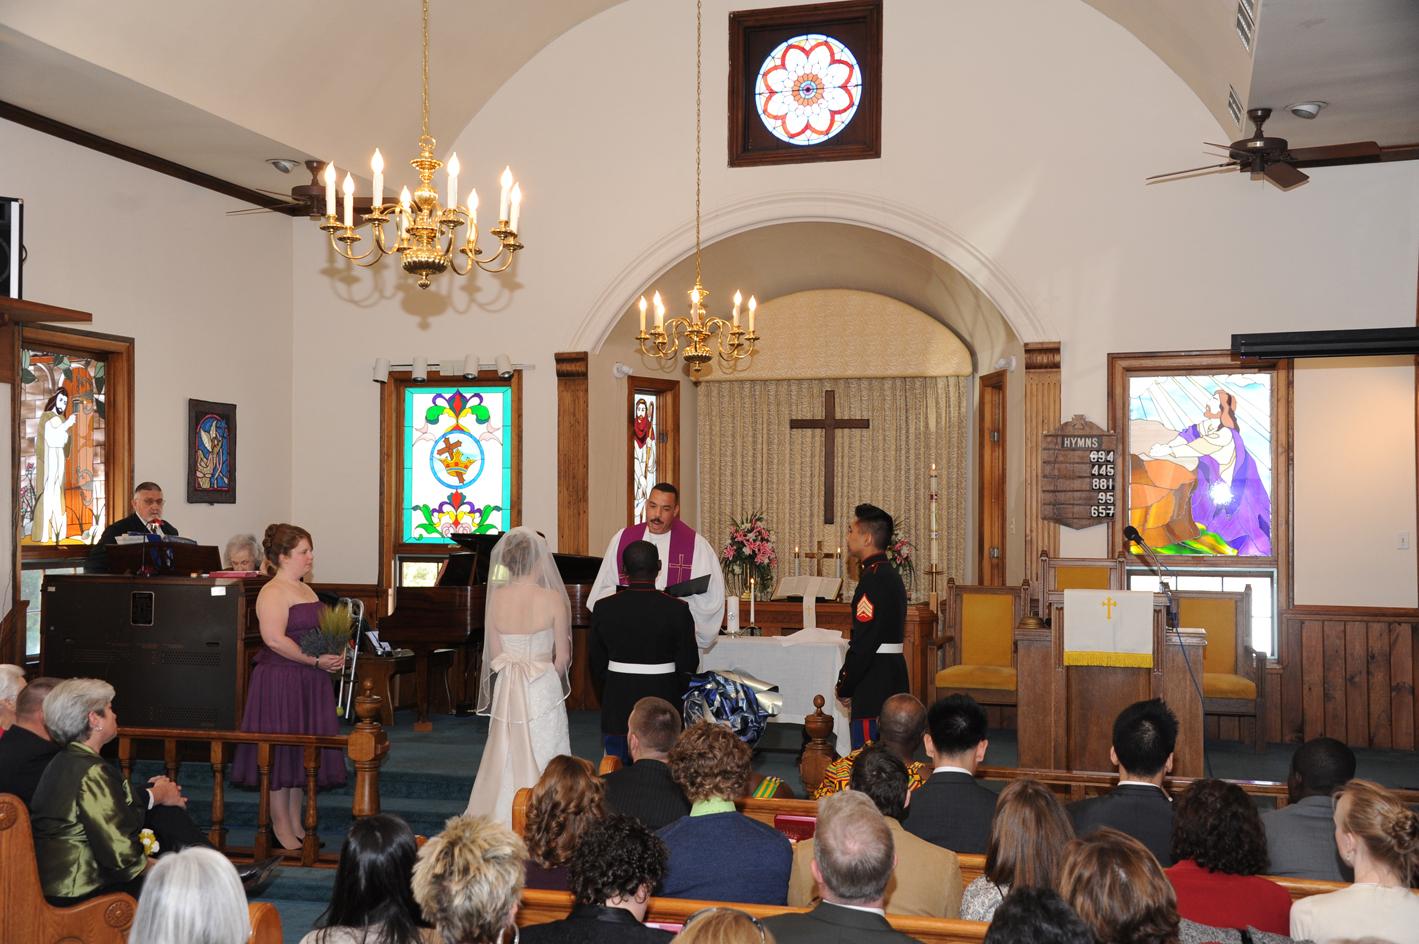 Wedding At The Smithville Mansion In Pemberton Nj